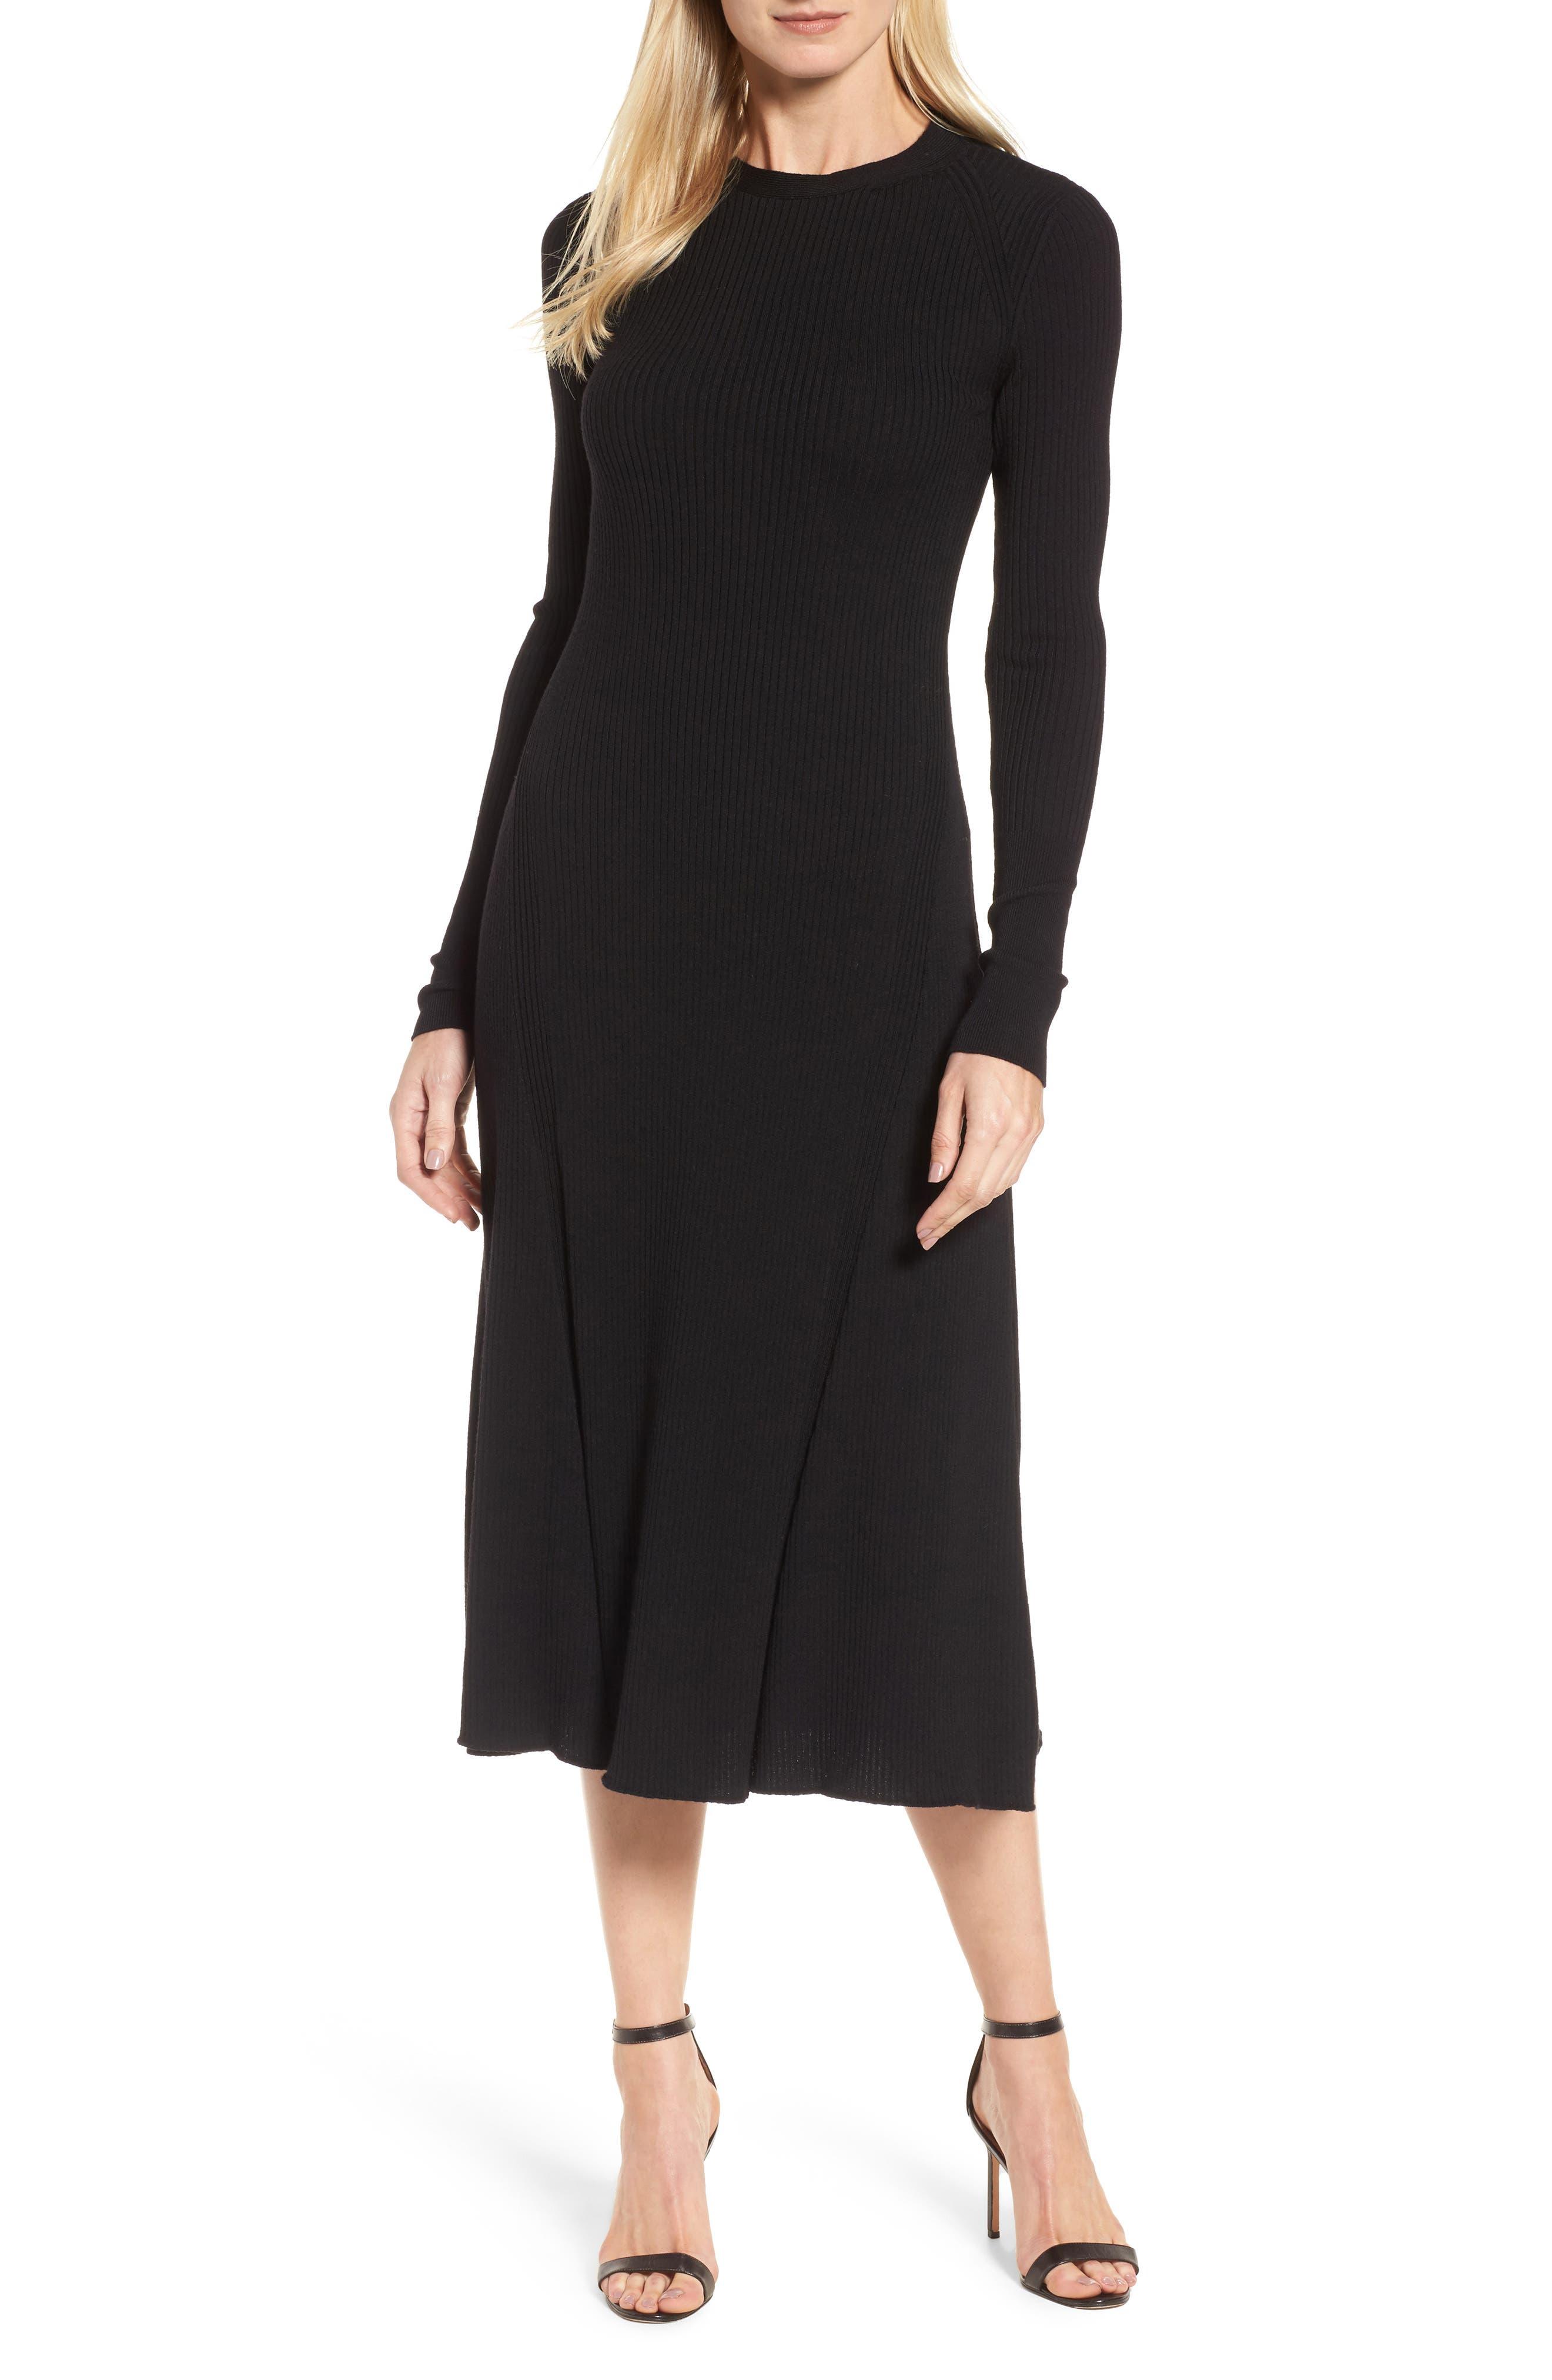 Faustine Midi Dress,                         Main,                         color, 001